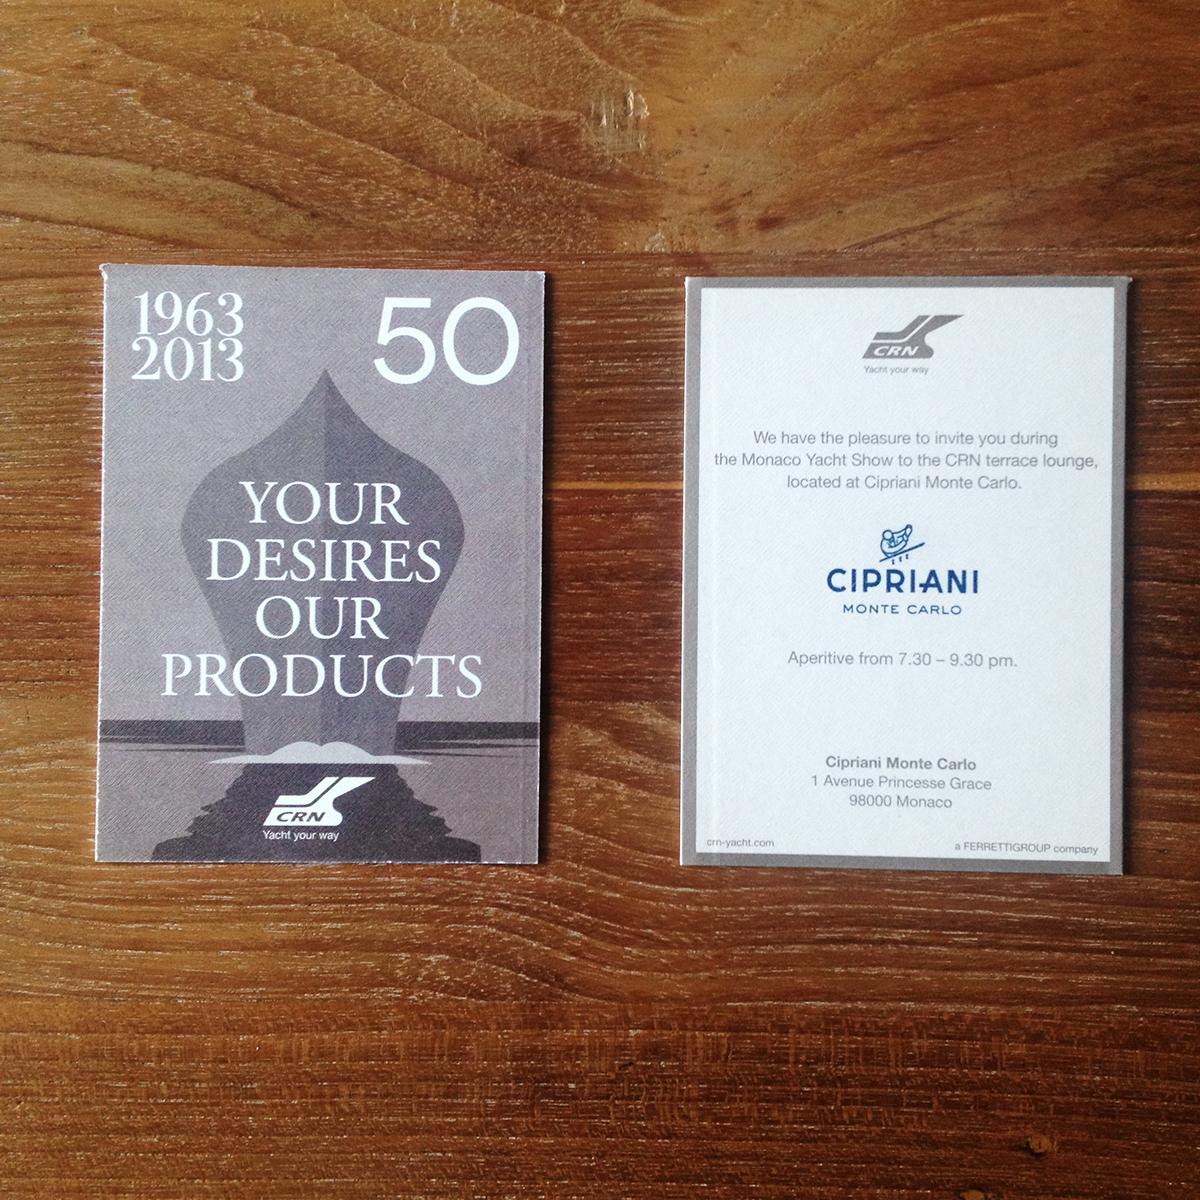 #belowtheline #graphicdesigner #Branding #Brochure #Corporate   #jewellery #boat #yacht #Fashion #realestate #hotel